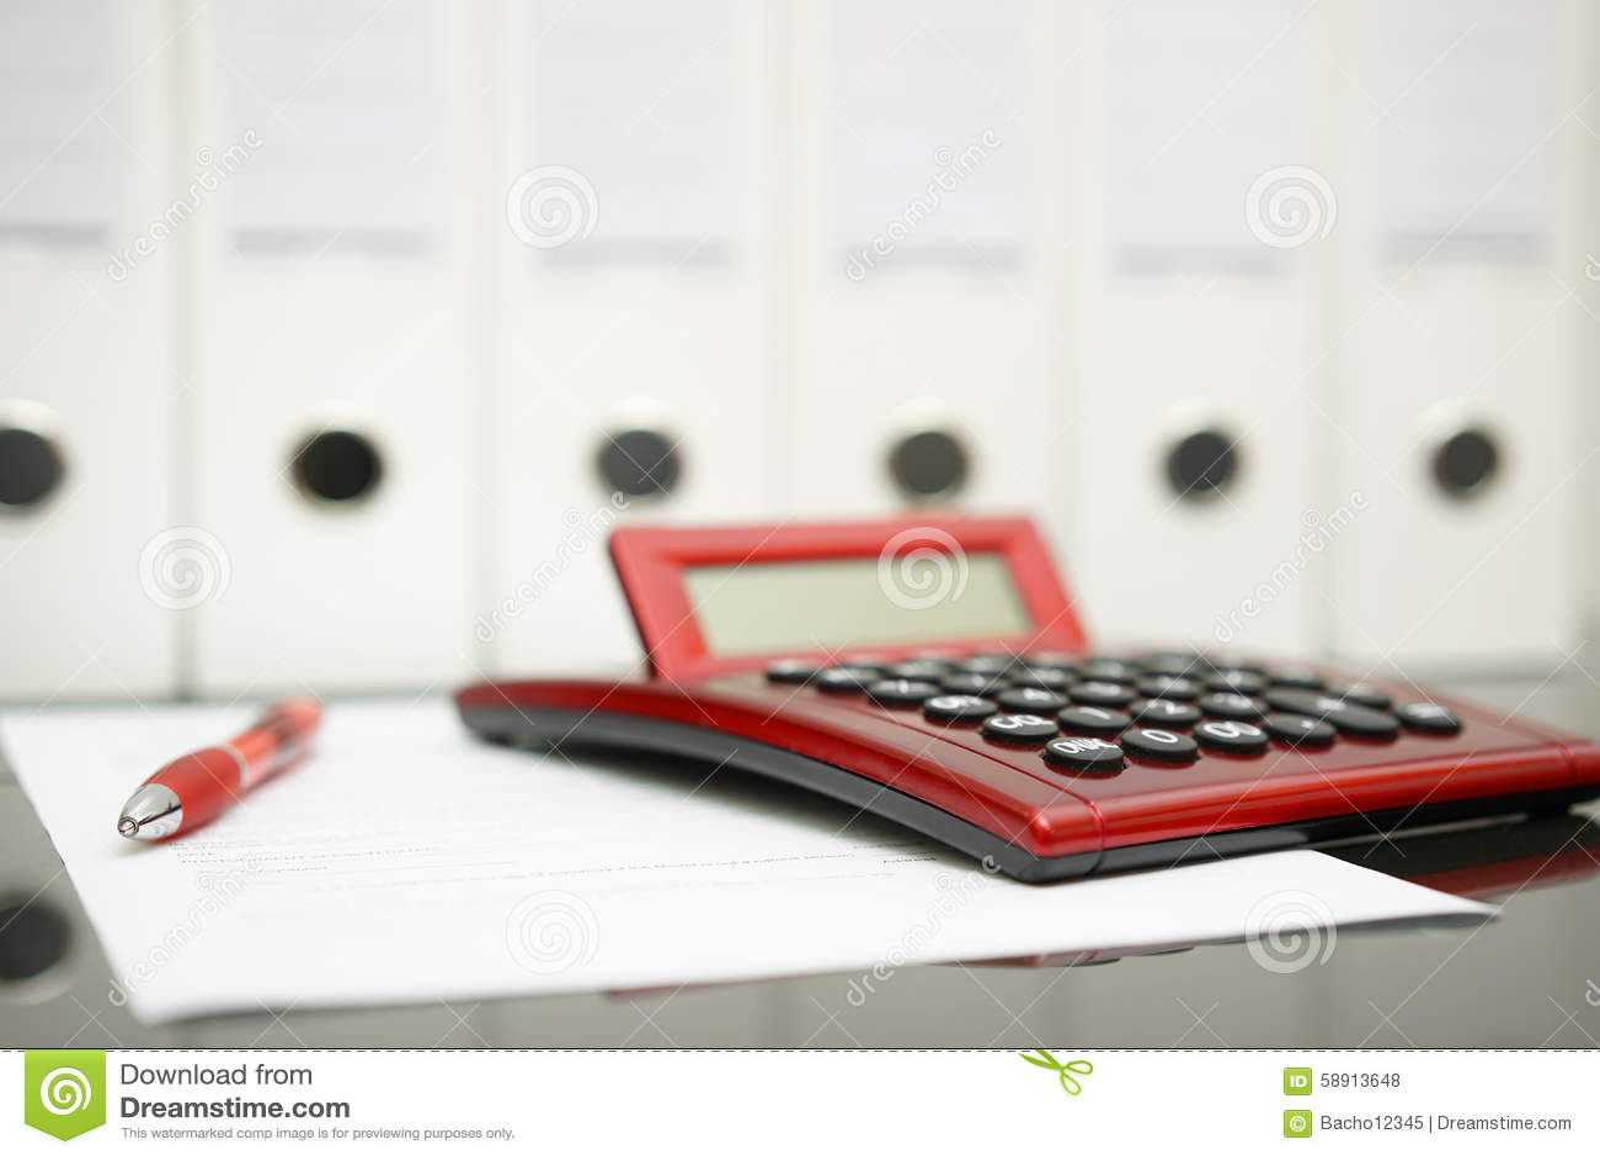 concept de bureau de comptable avec la calculatrice stylo document photo stock image 58913648. Black Bedroom Furniture Sets. Home Design Ideas